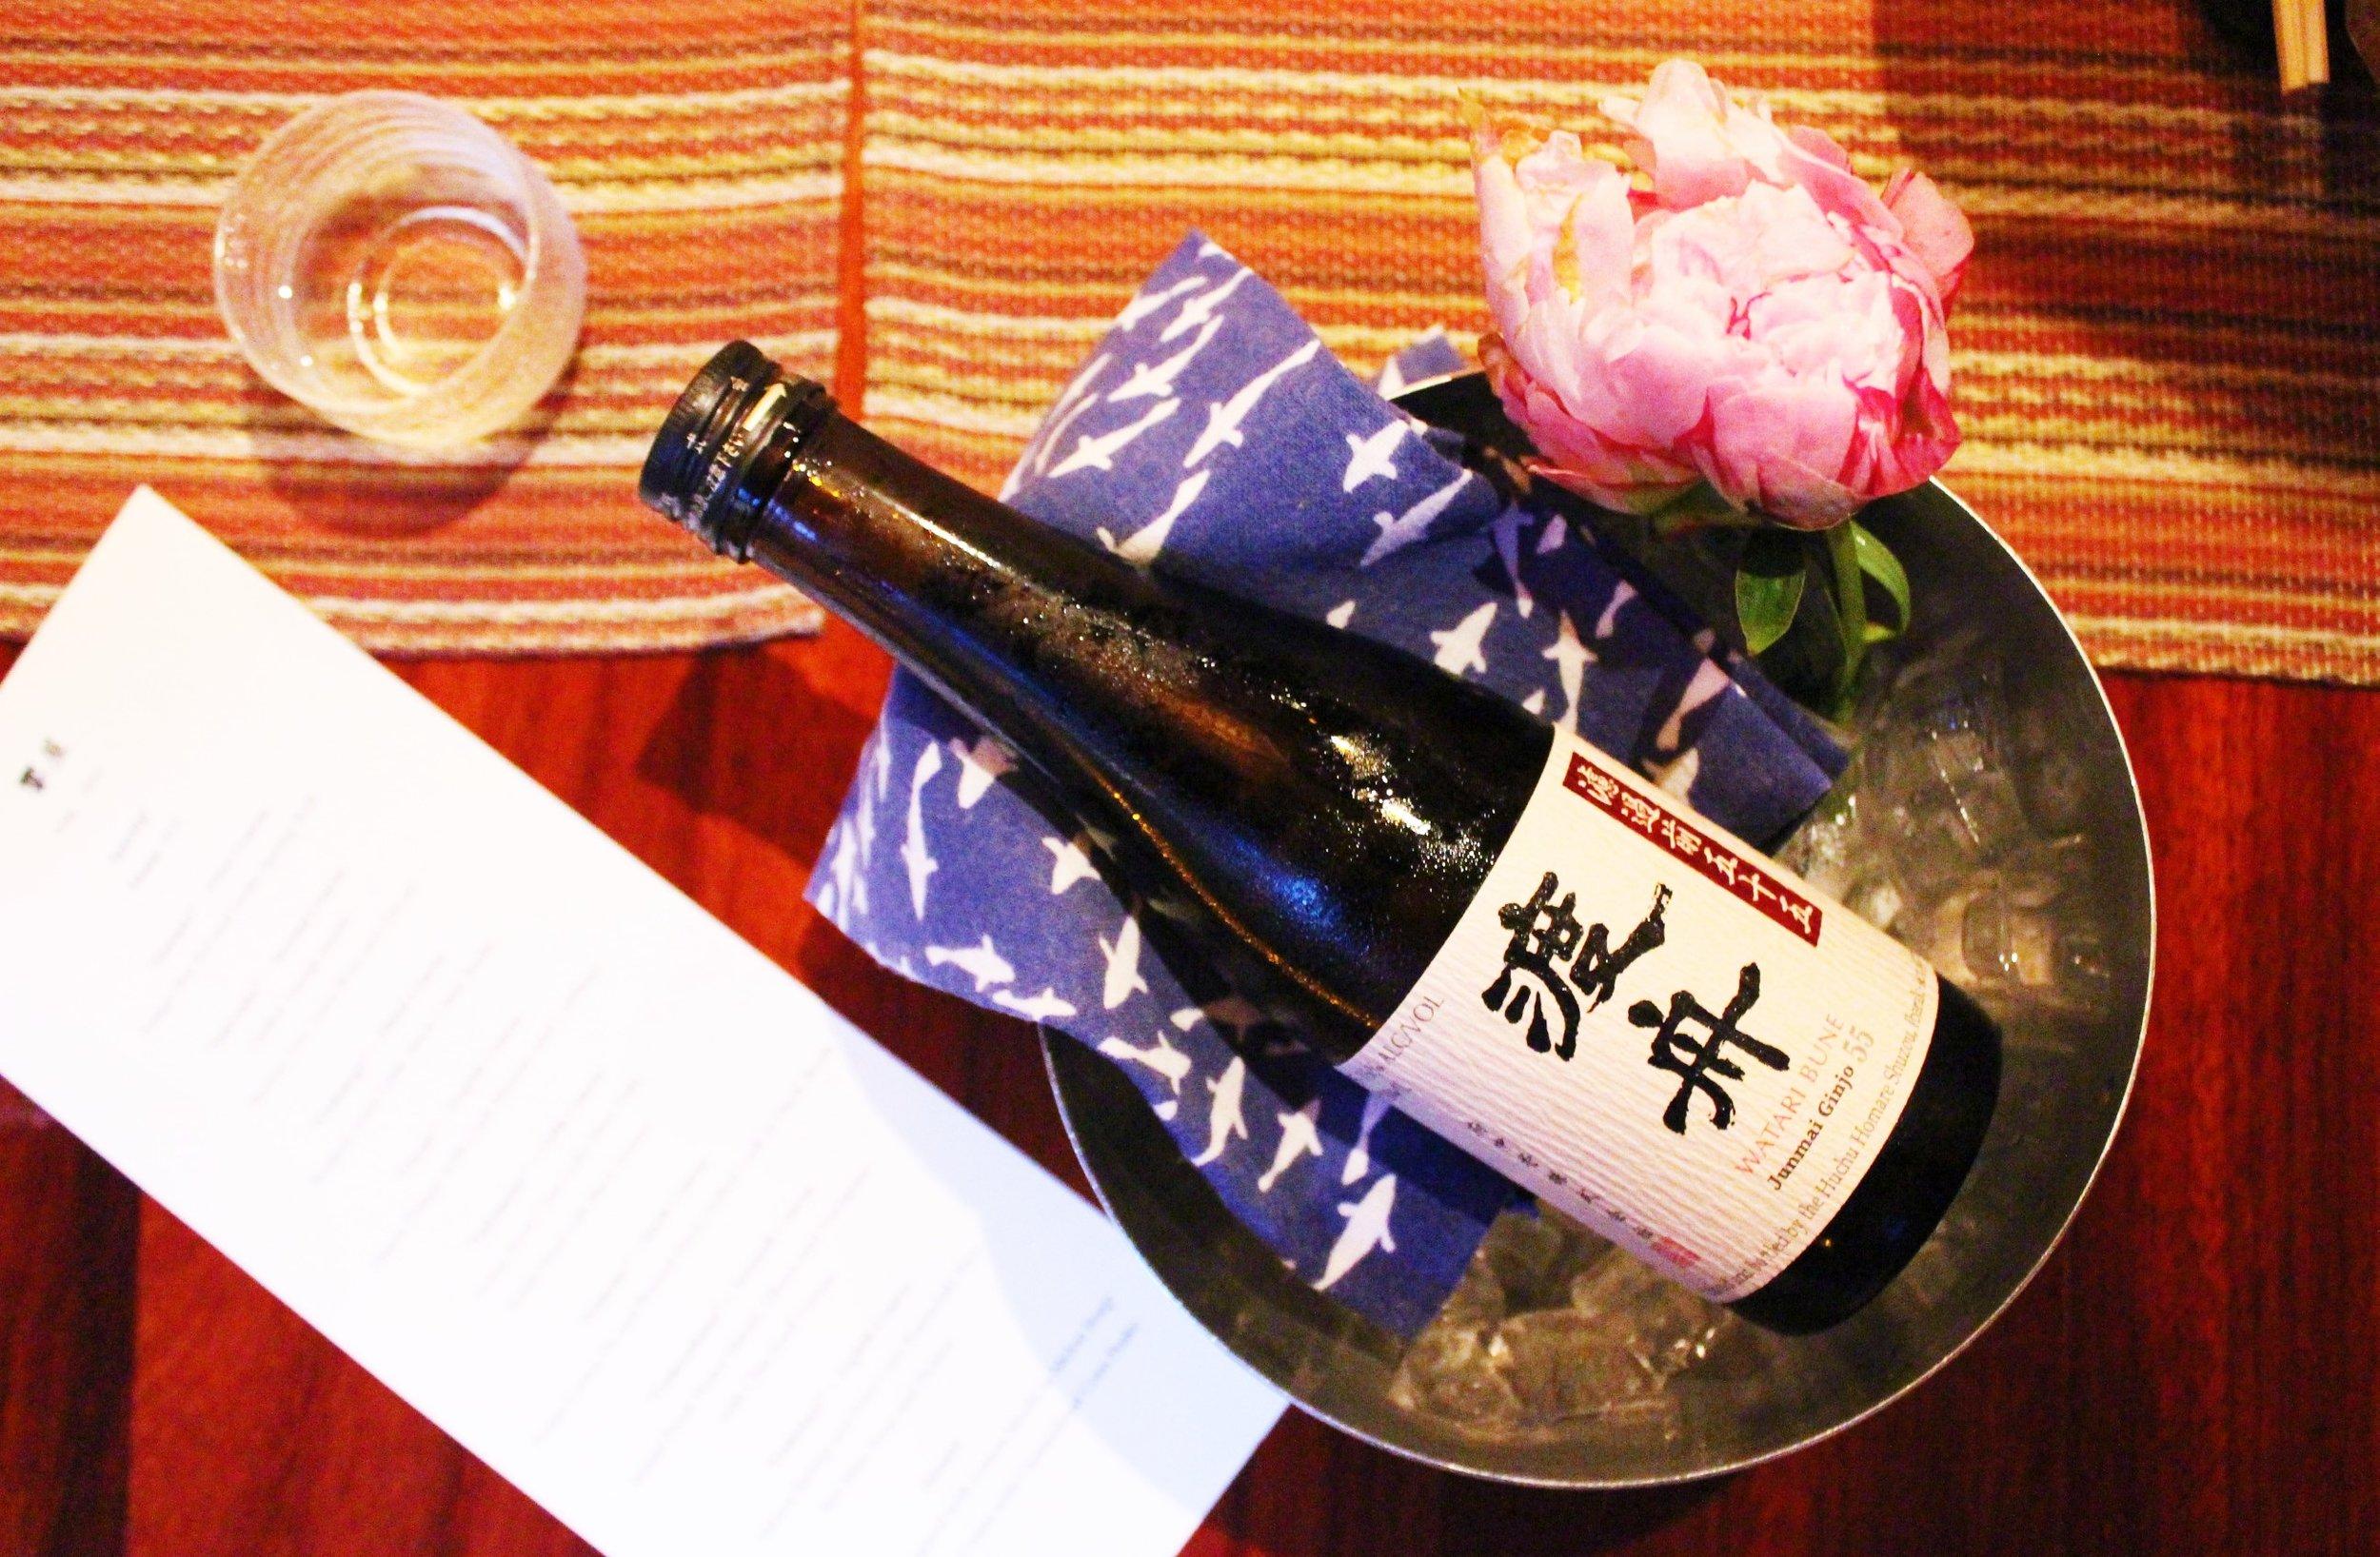 Sake: Watari Bune Junmai Ginjo